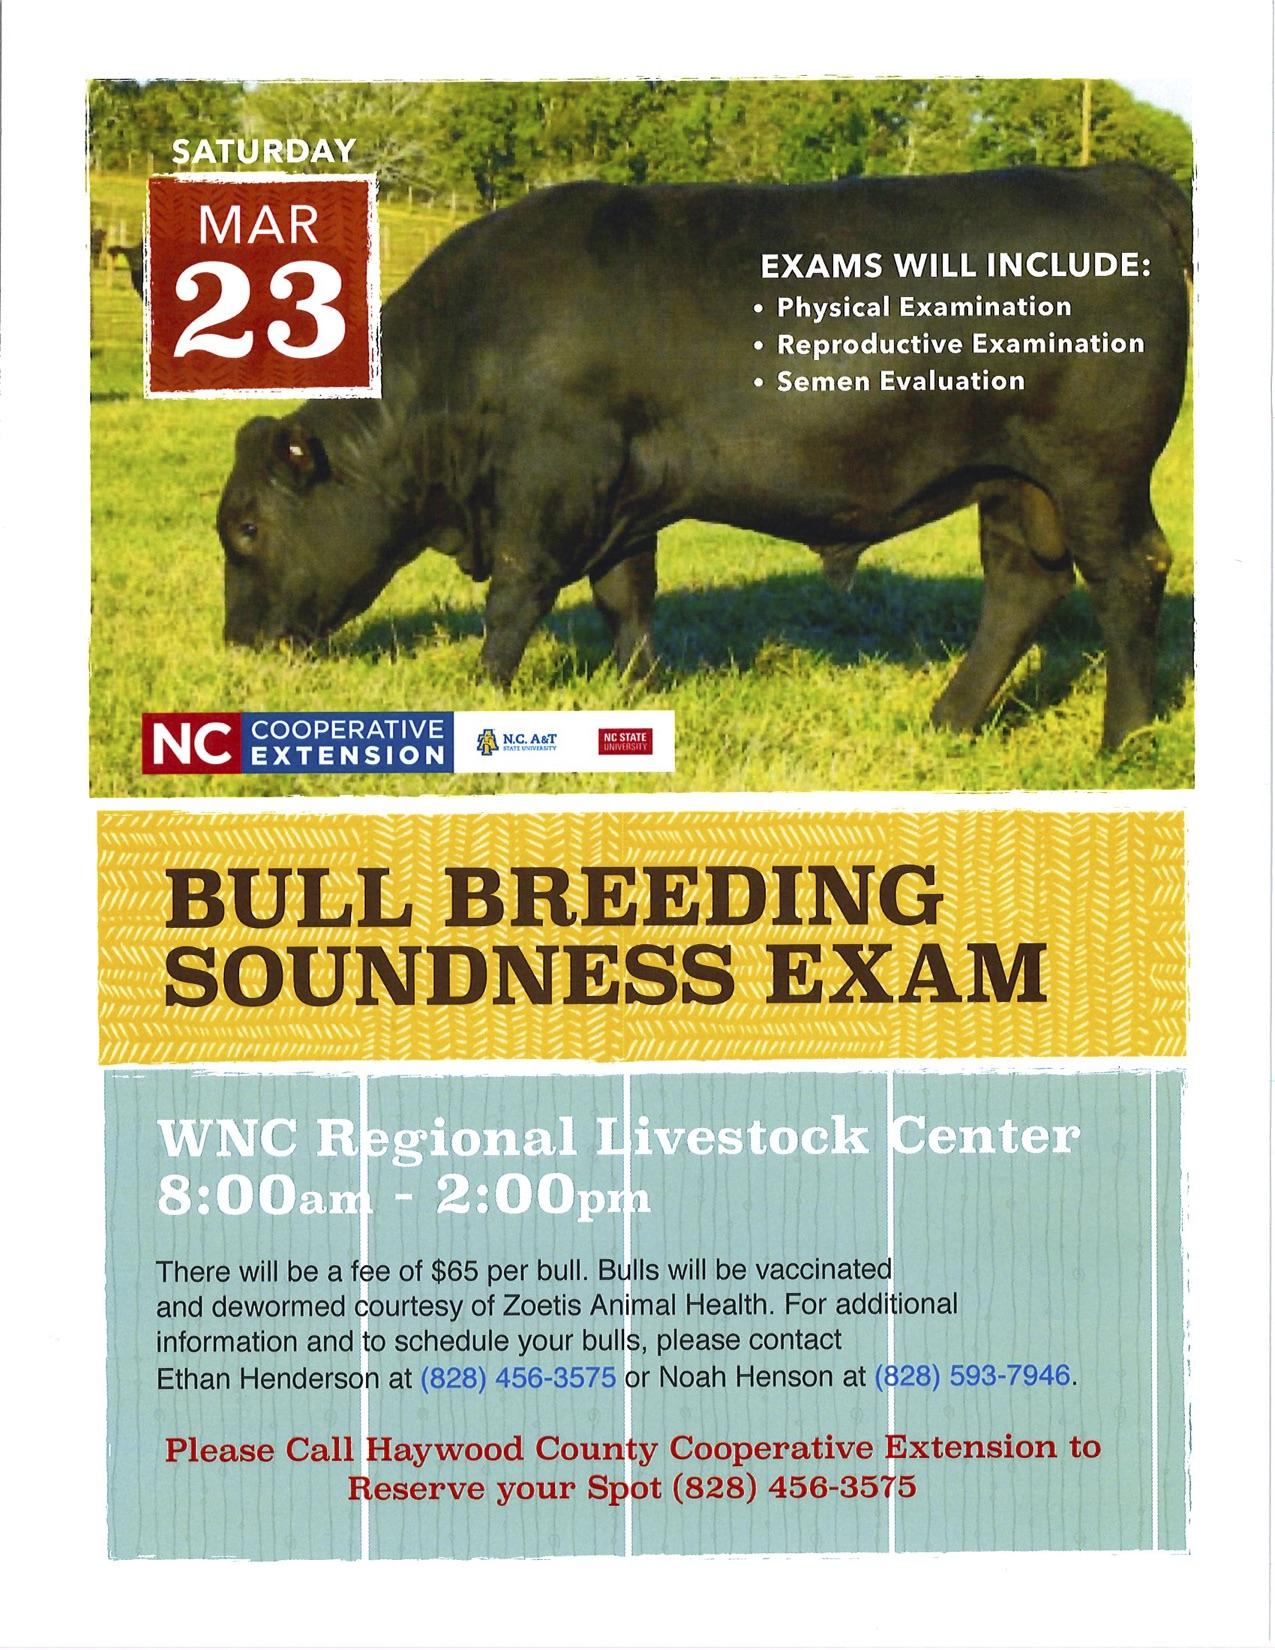 Bull breeding flyer image